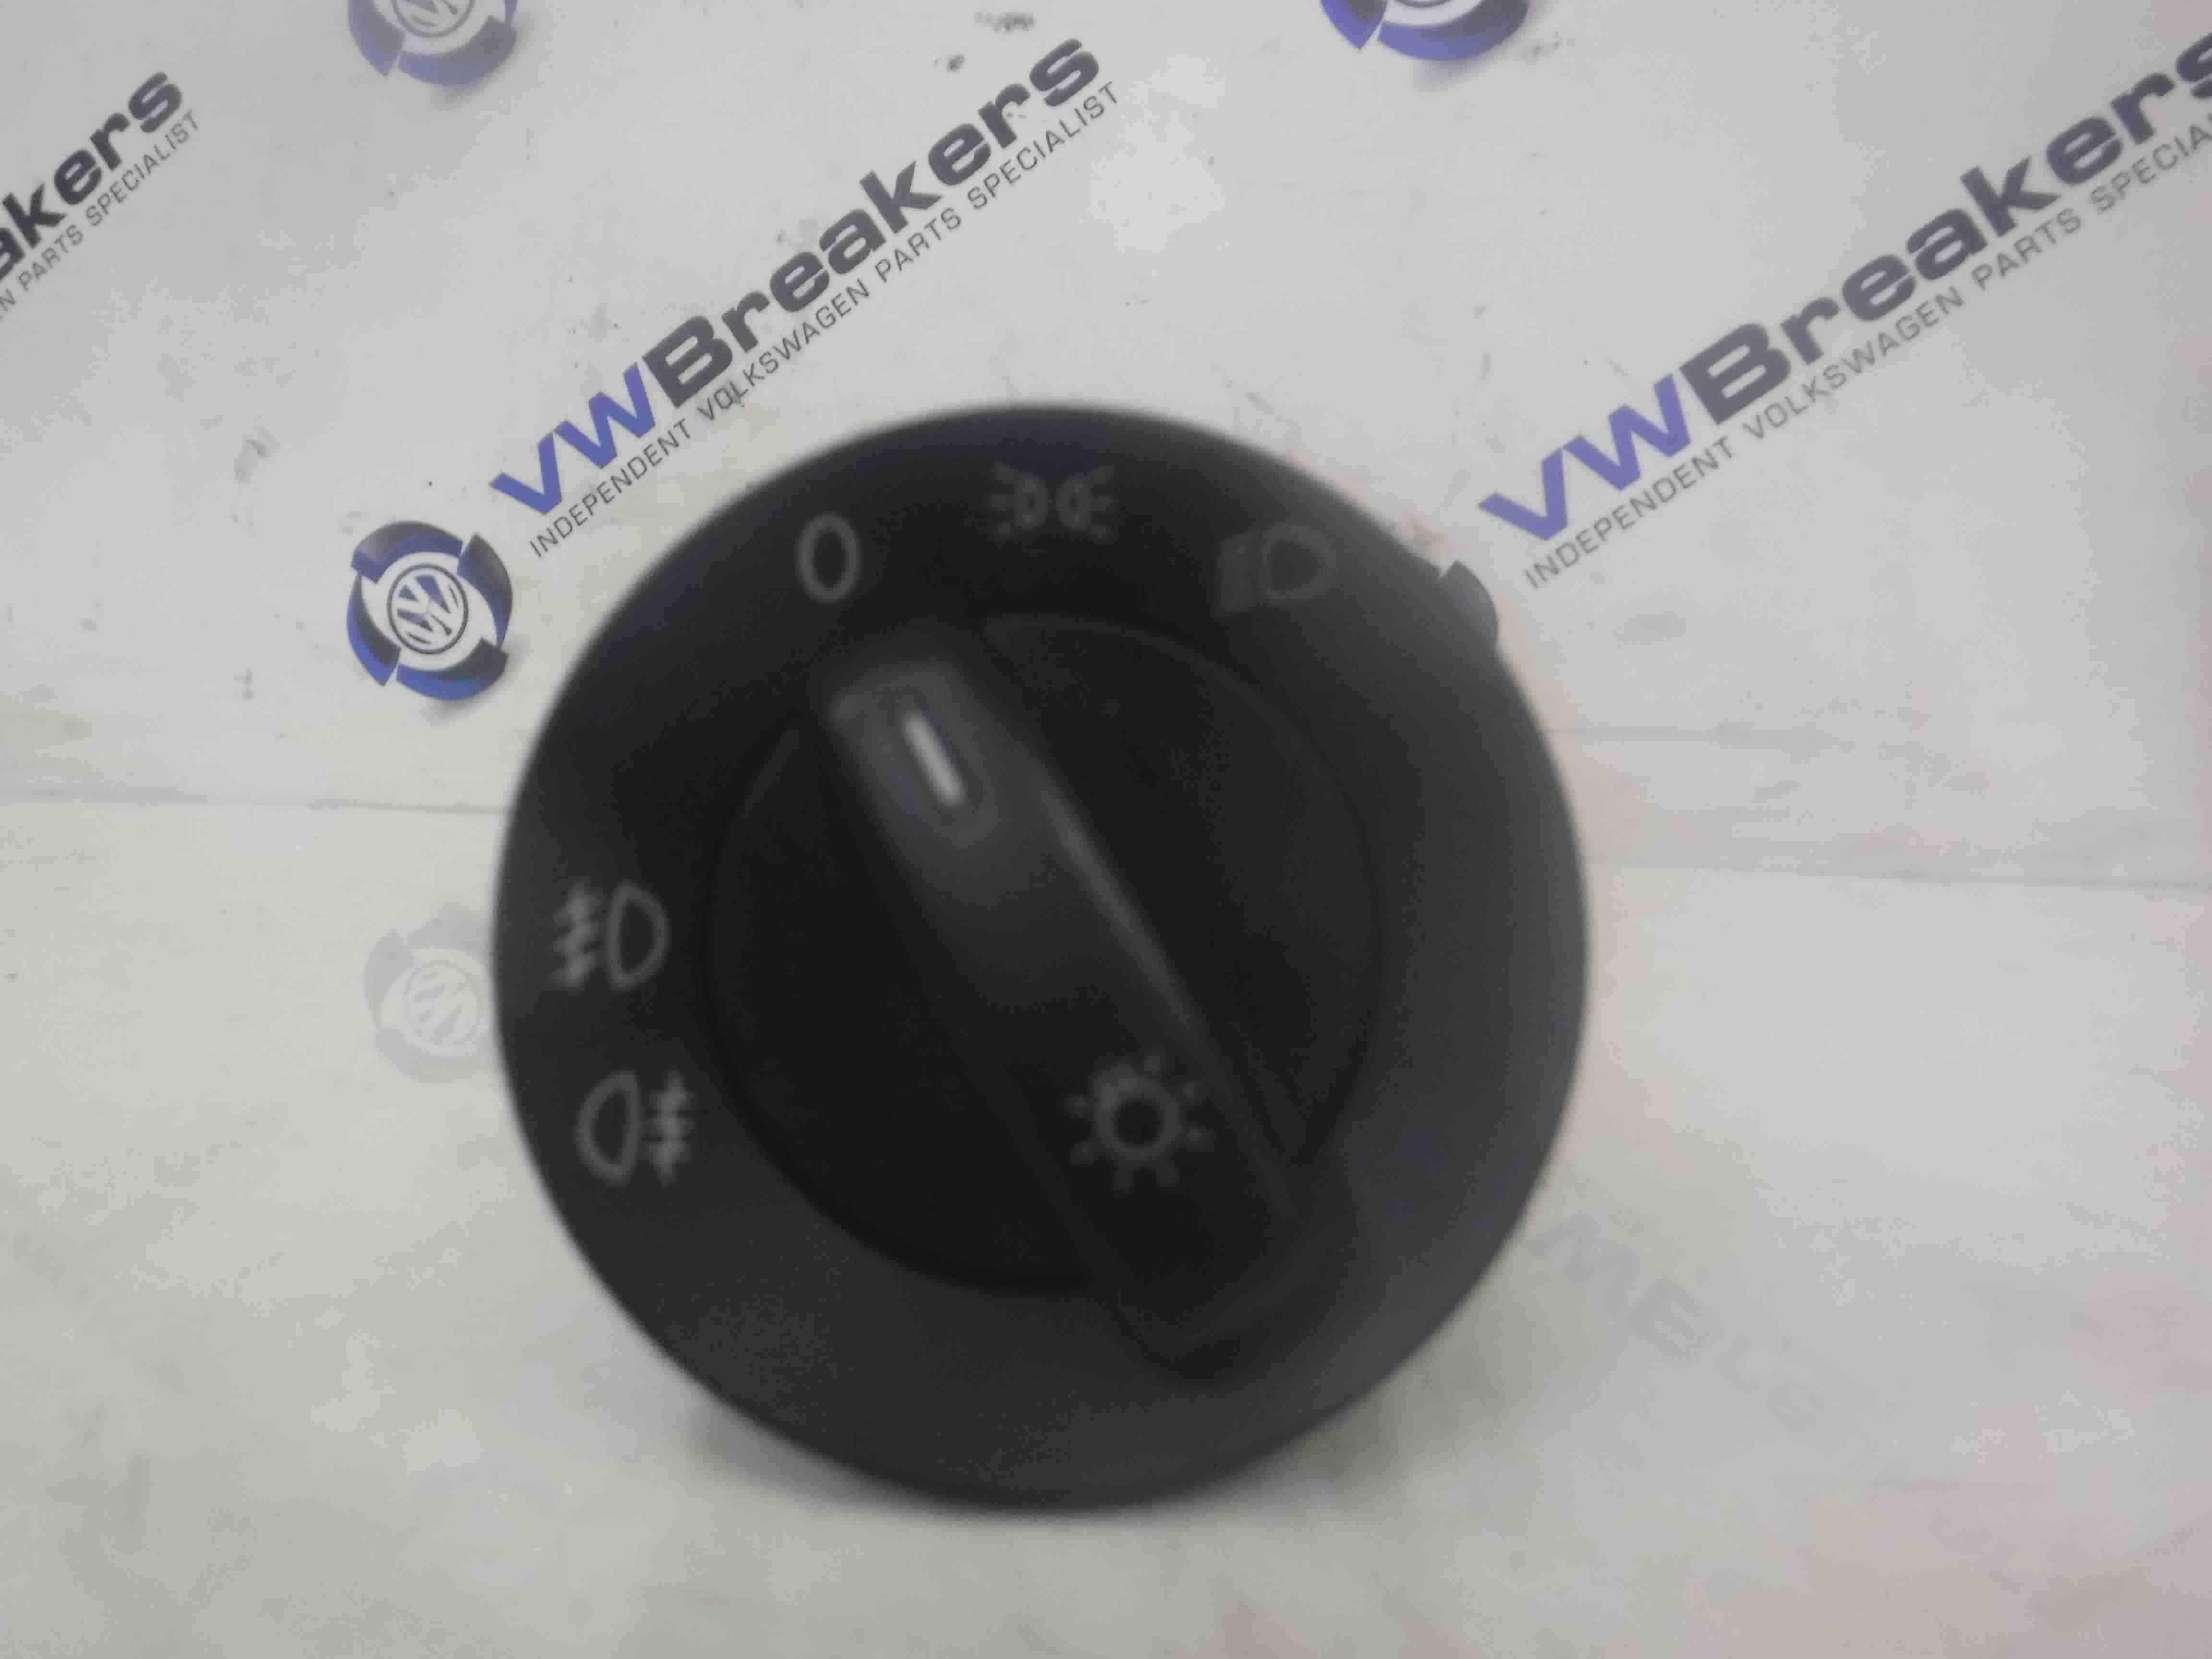 Volkswagen EOS 2005-2016 Headlight Adjuster Panels Auto Lights 1K0941431AJ